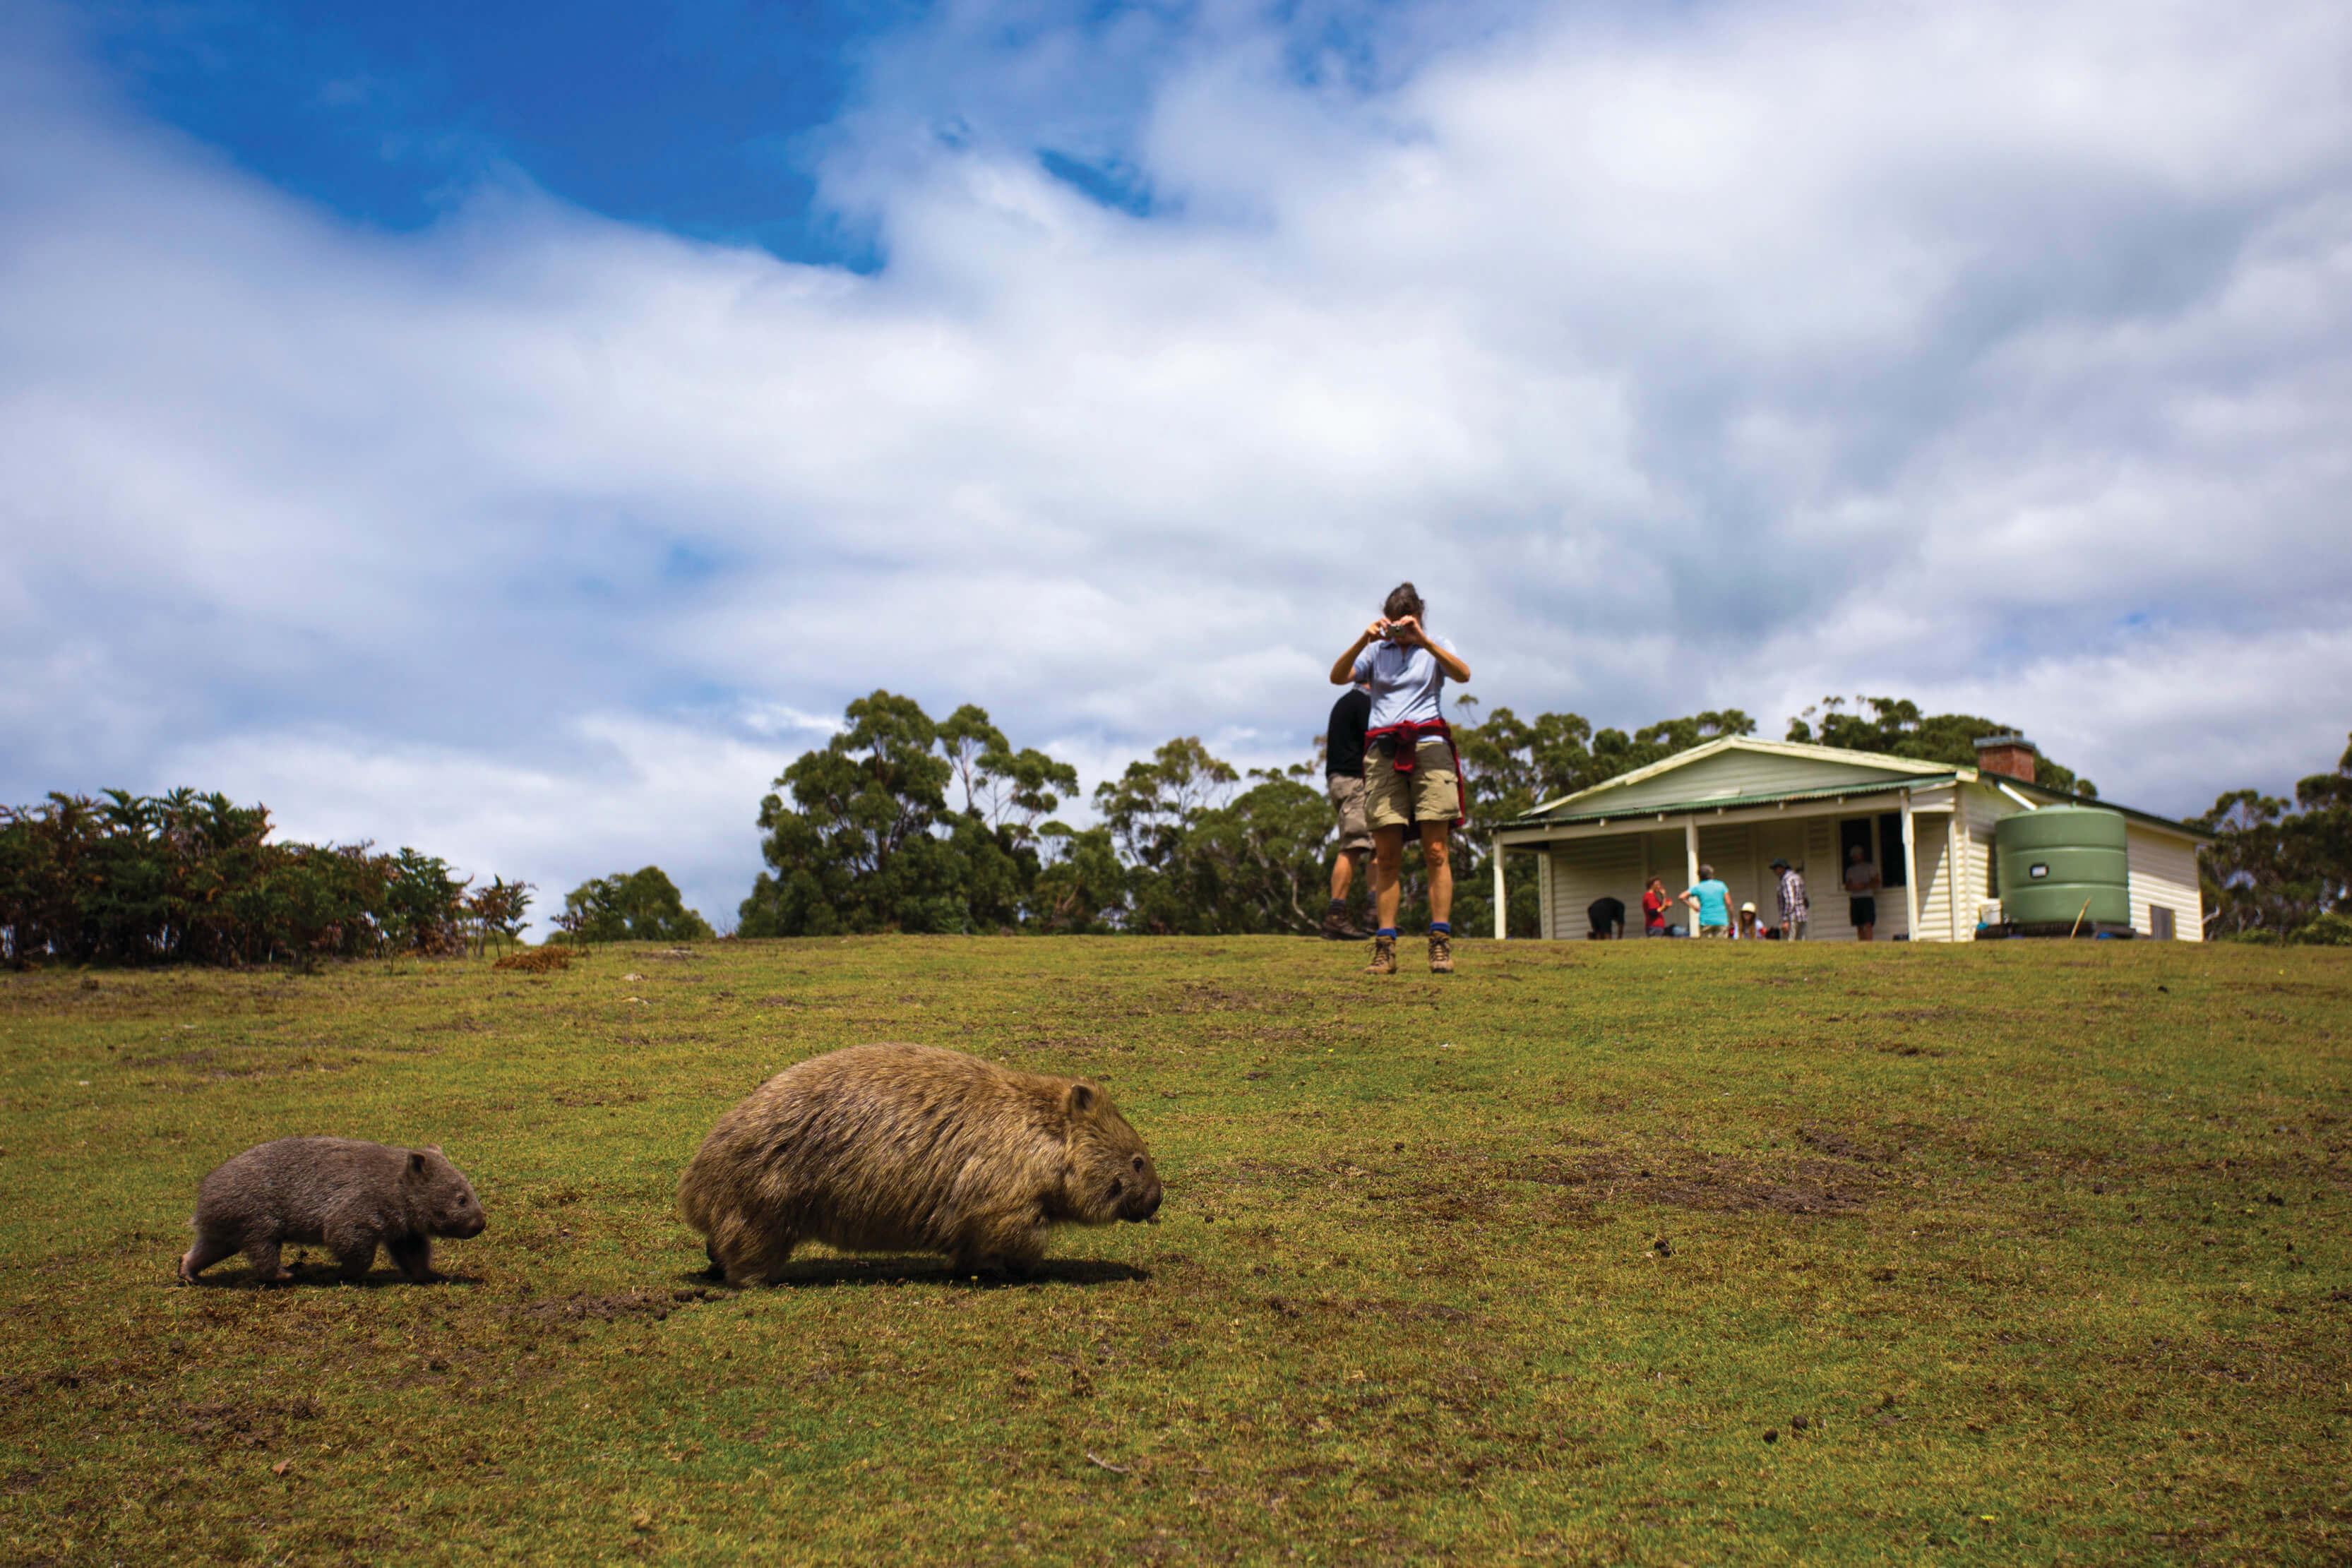 East-Coast-Tasmania Maria-Island Great-Walks-of-Australia-The-Maria-Island-Walk Wildlife Wombats 128677-2